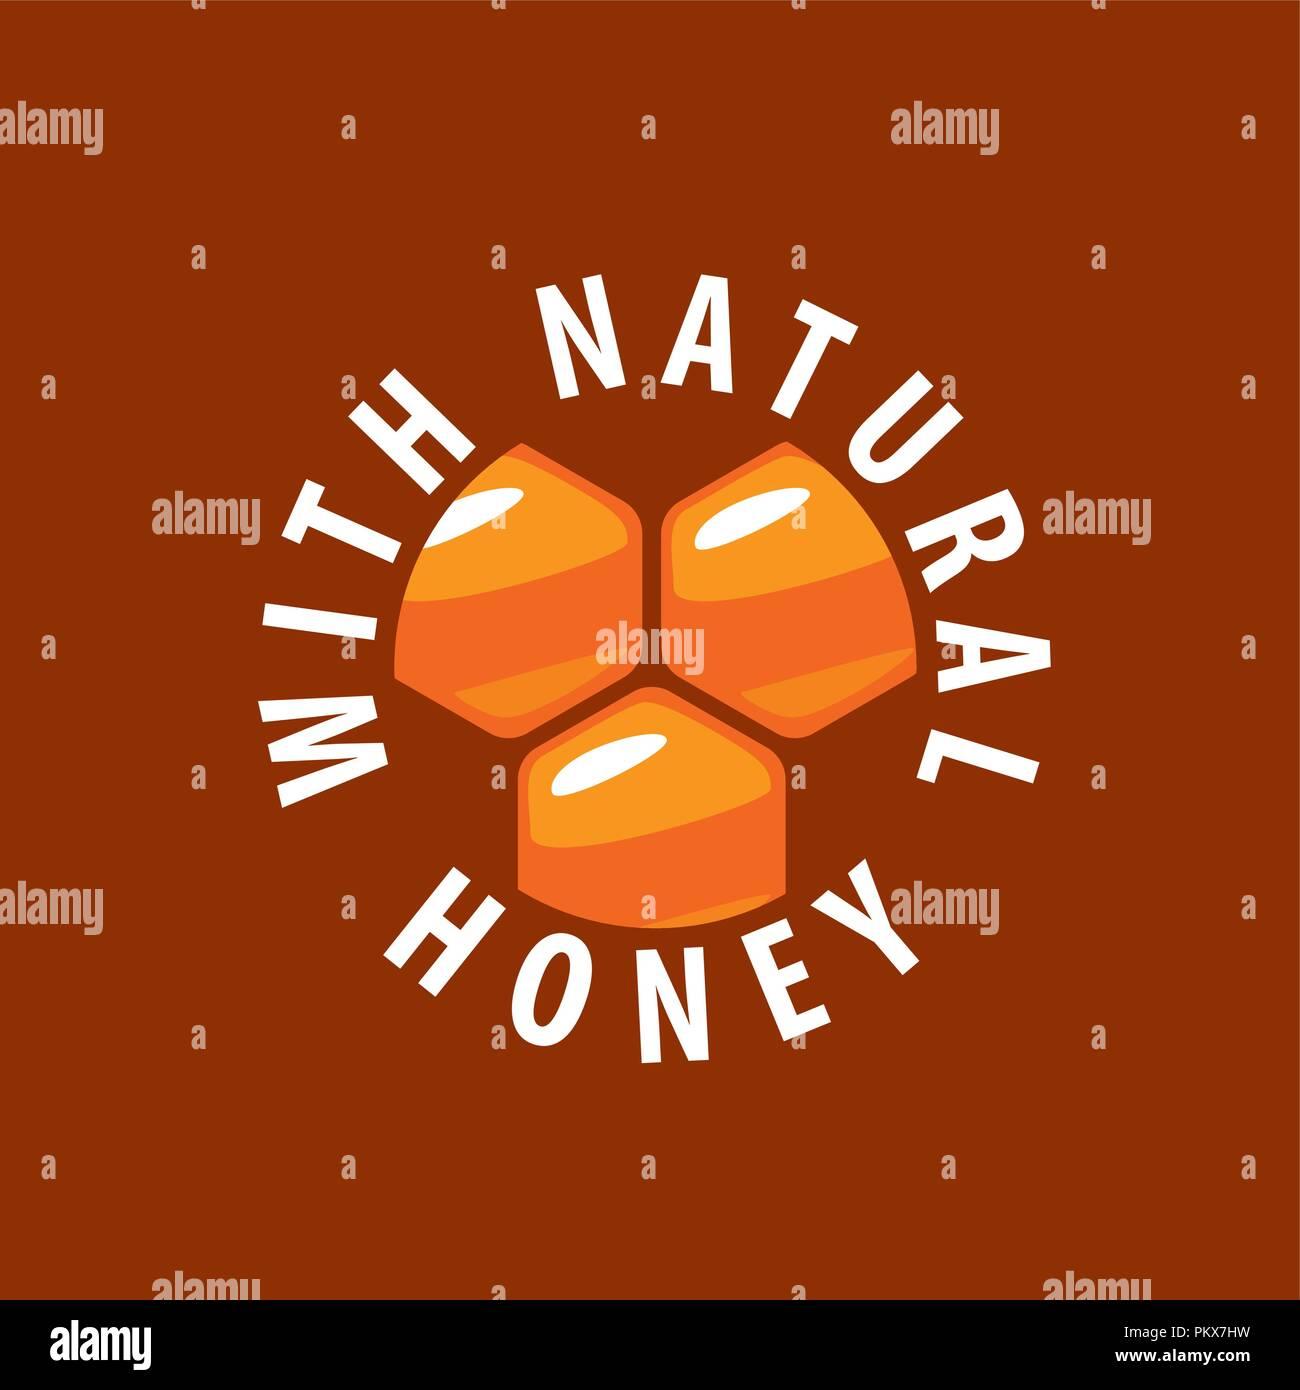 vector honey logo - Stock Image